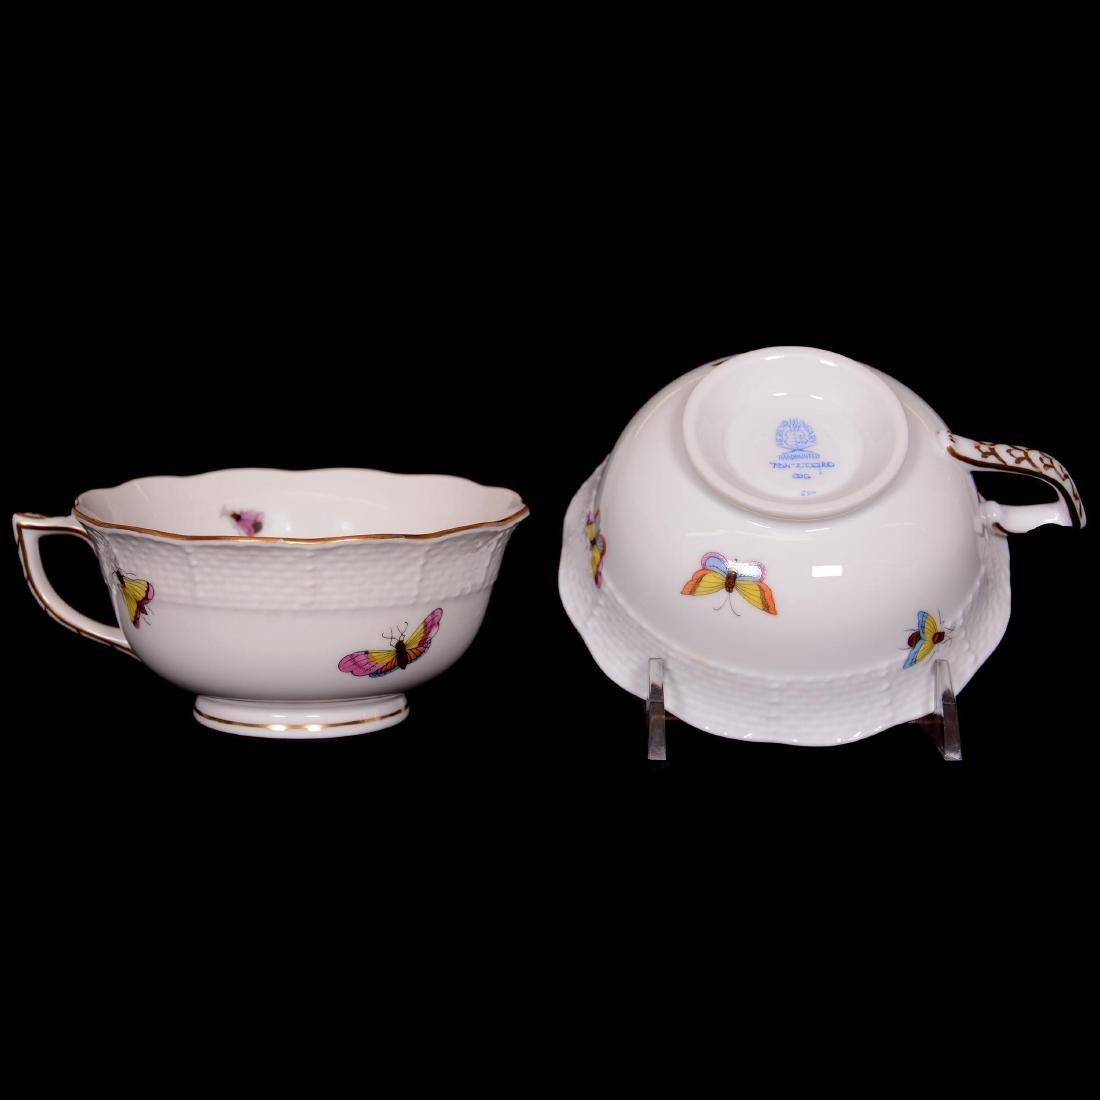 Herend Hungary Porcelain Hand Painted Fifteen Piece Tea - 6